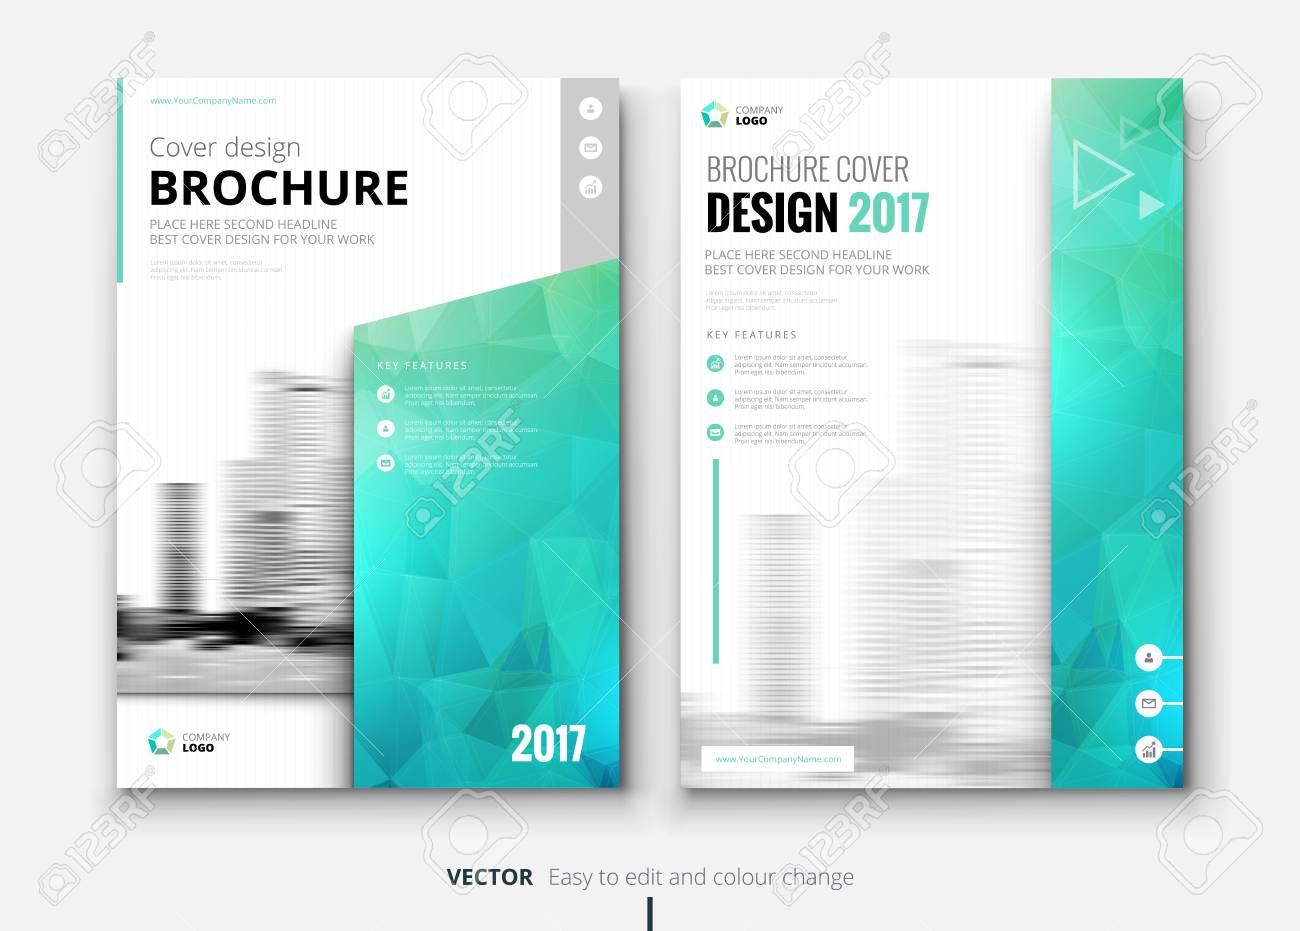 Brochure Design Corporate Business Template For Brochure Report